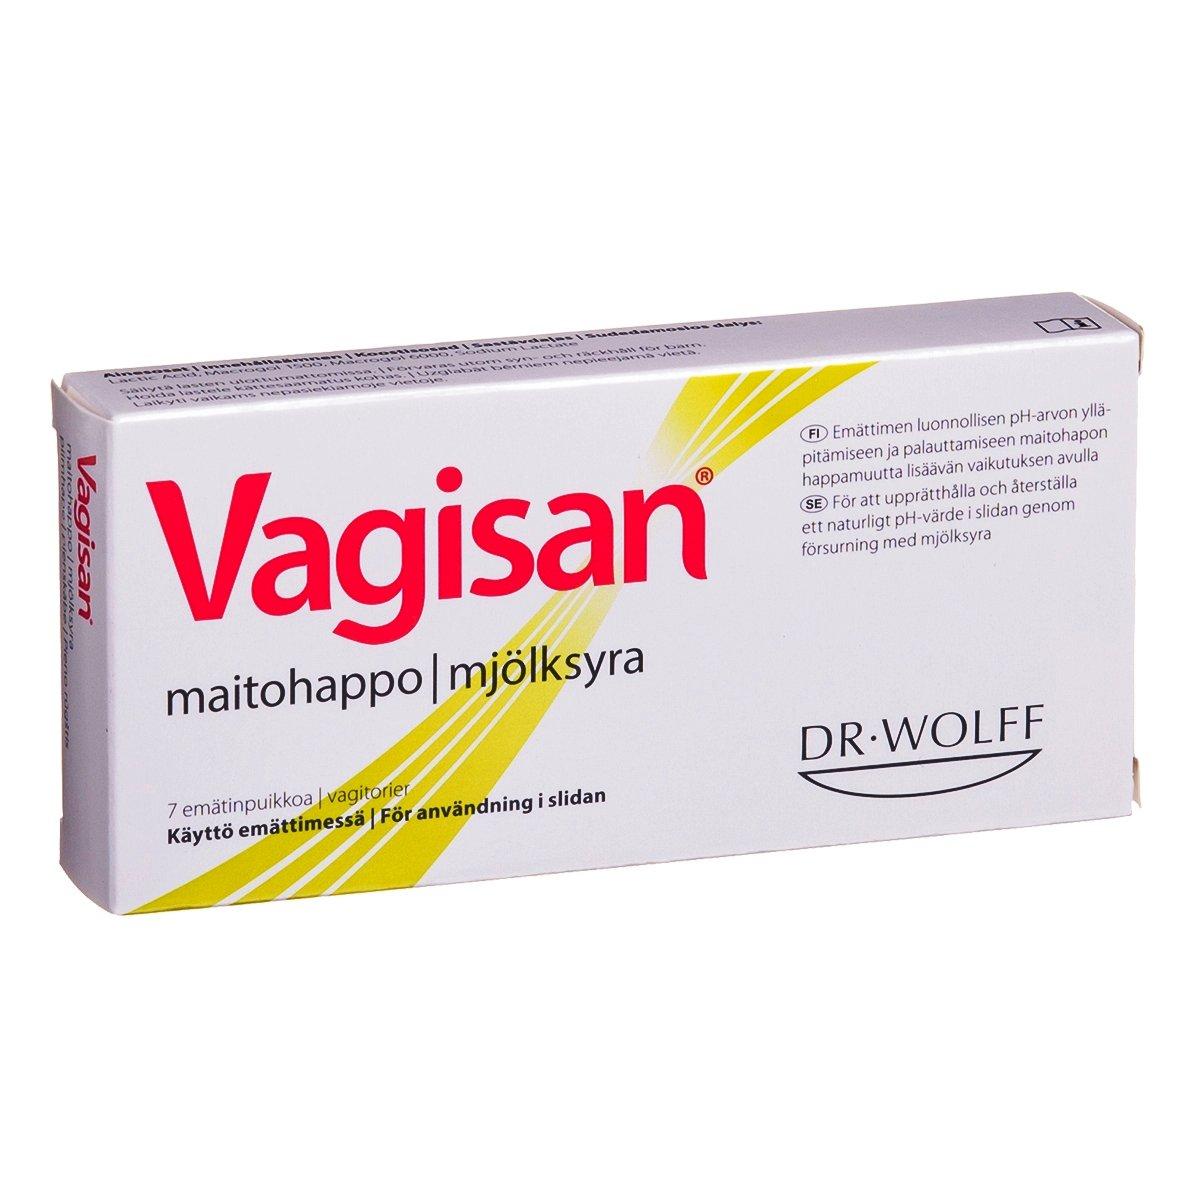 Vagisan Lactic Acid Pessaries N7.. Restores Vaginal Flora and PH. Hormone-free CE device